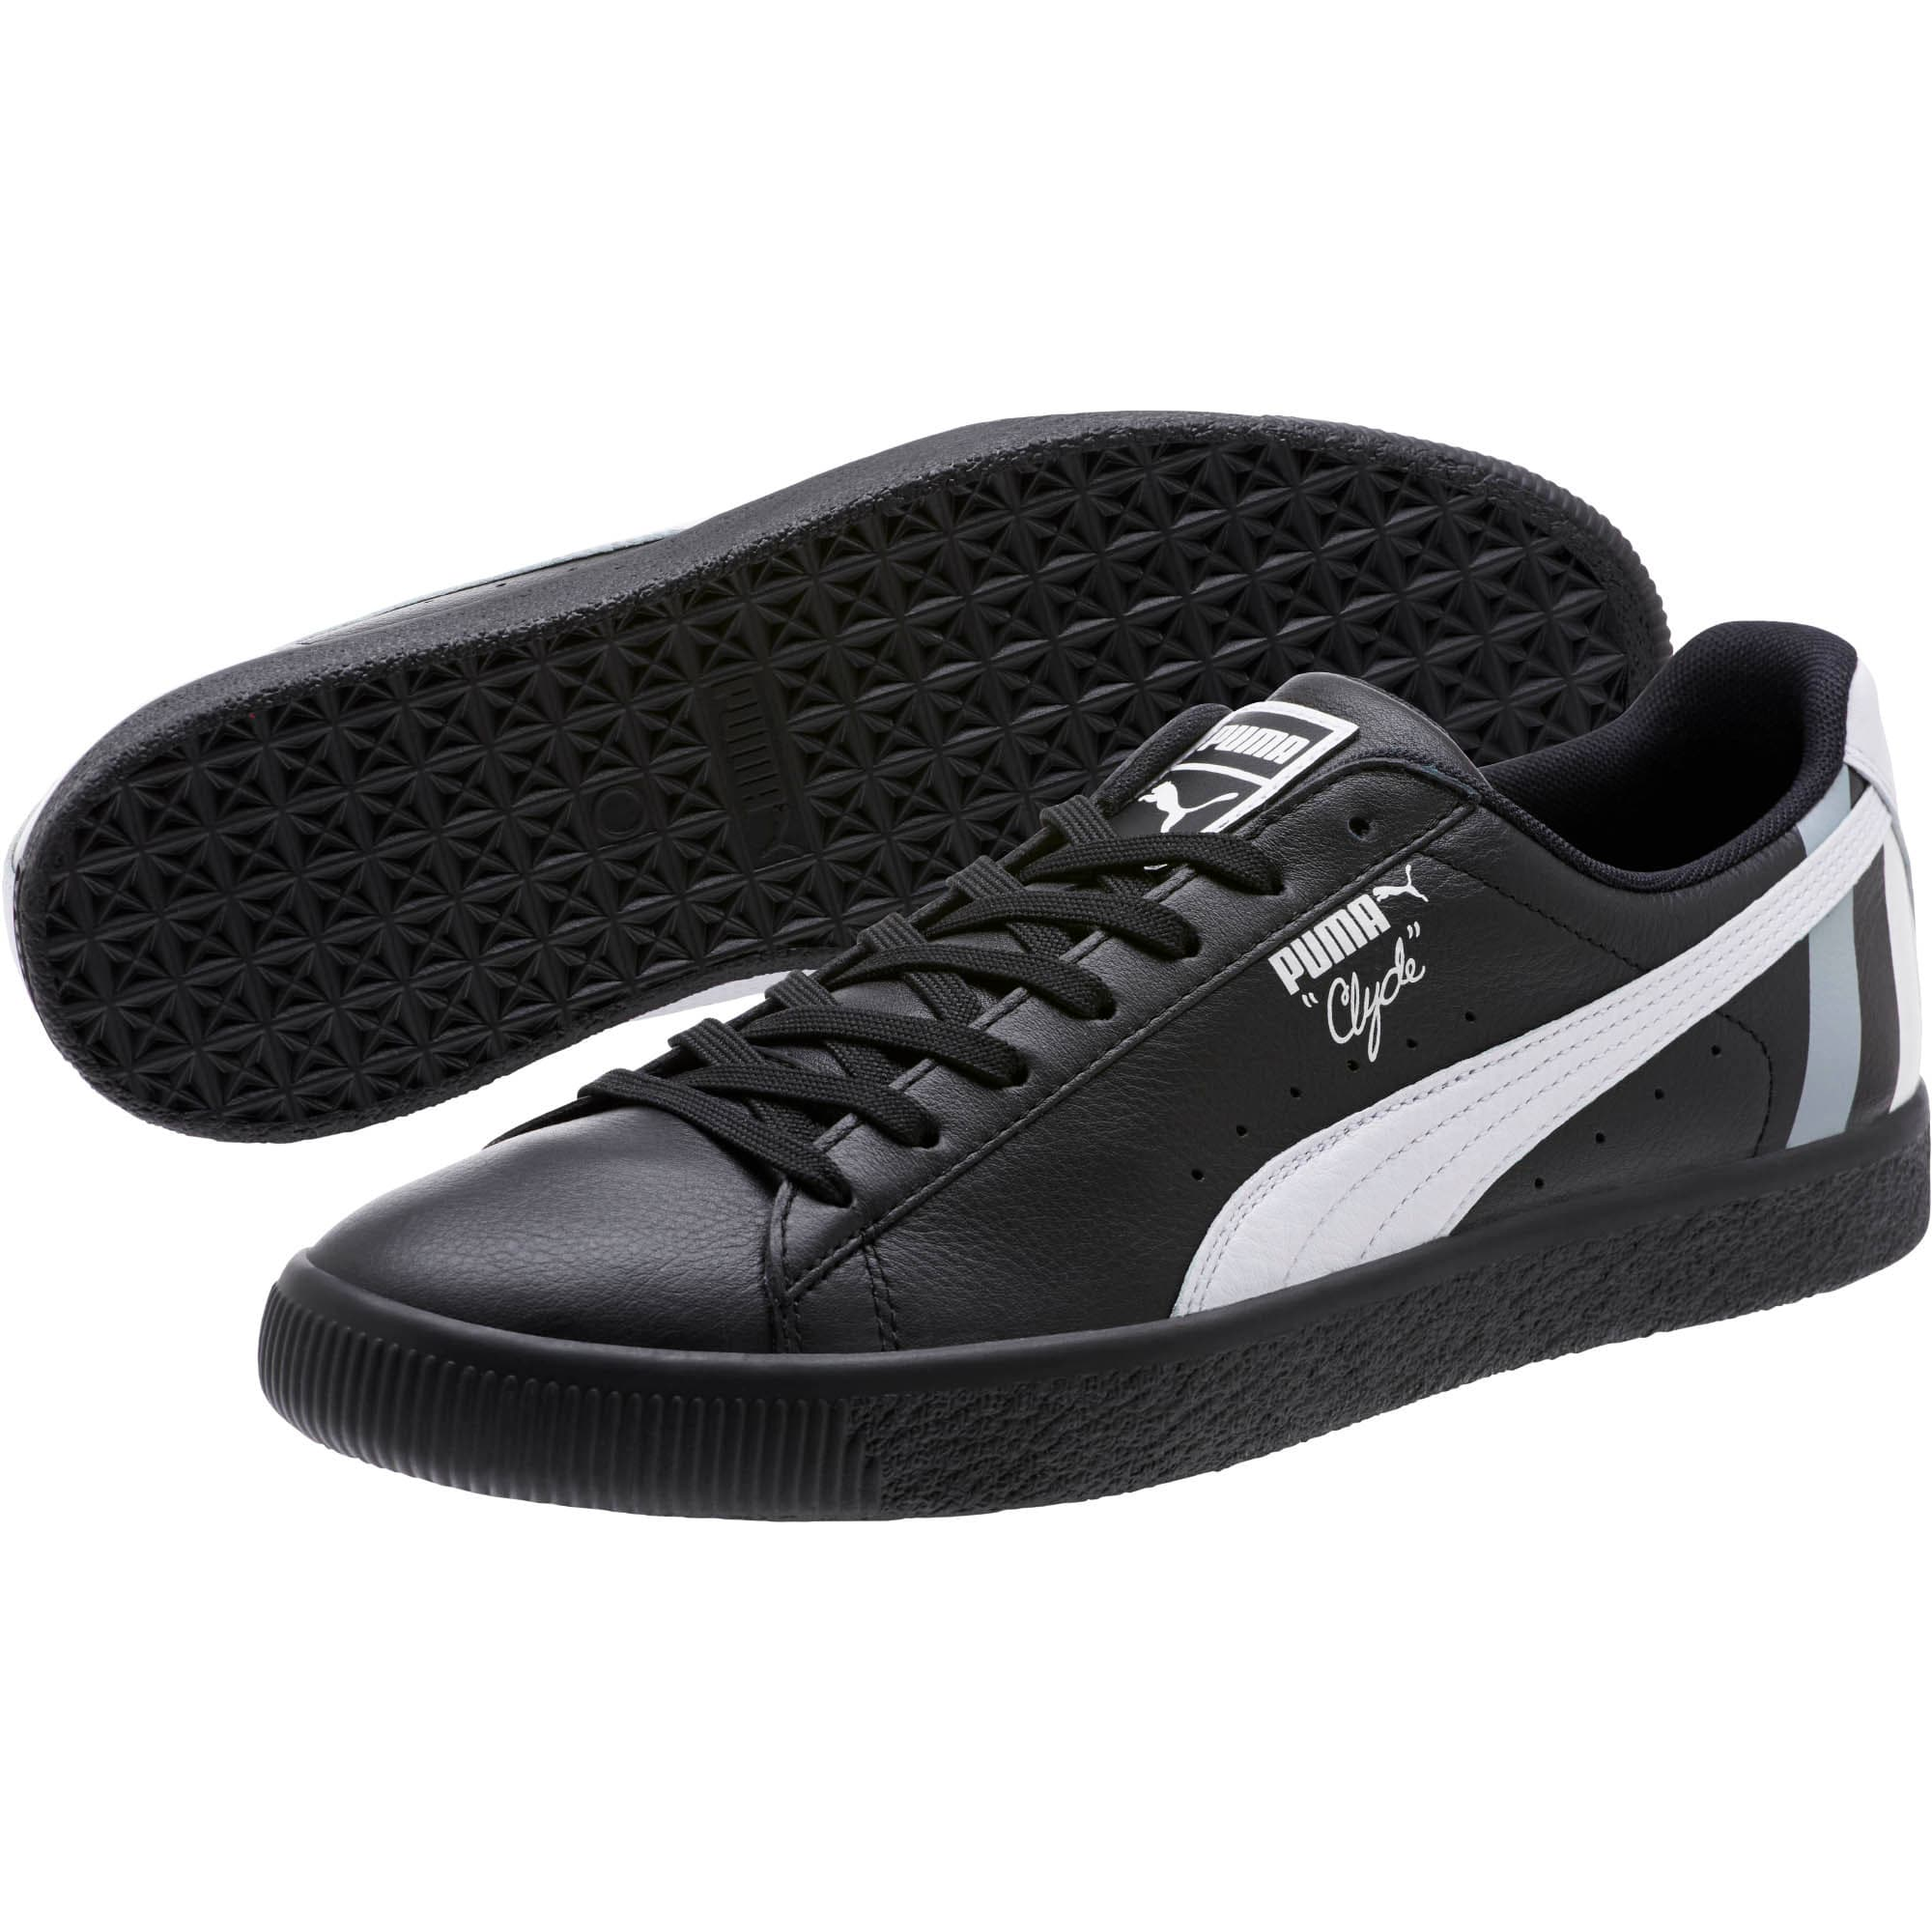 Thumbnail 2 of Clyde Stripes Men's Sneakers, Puma Black-Puma White, medium